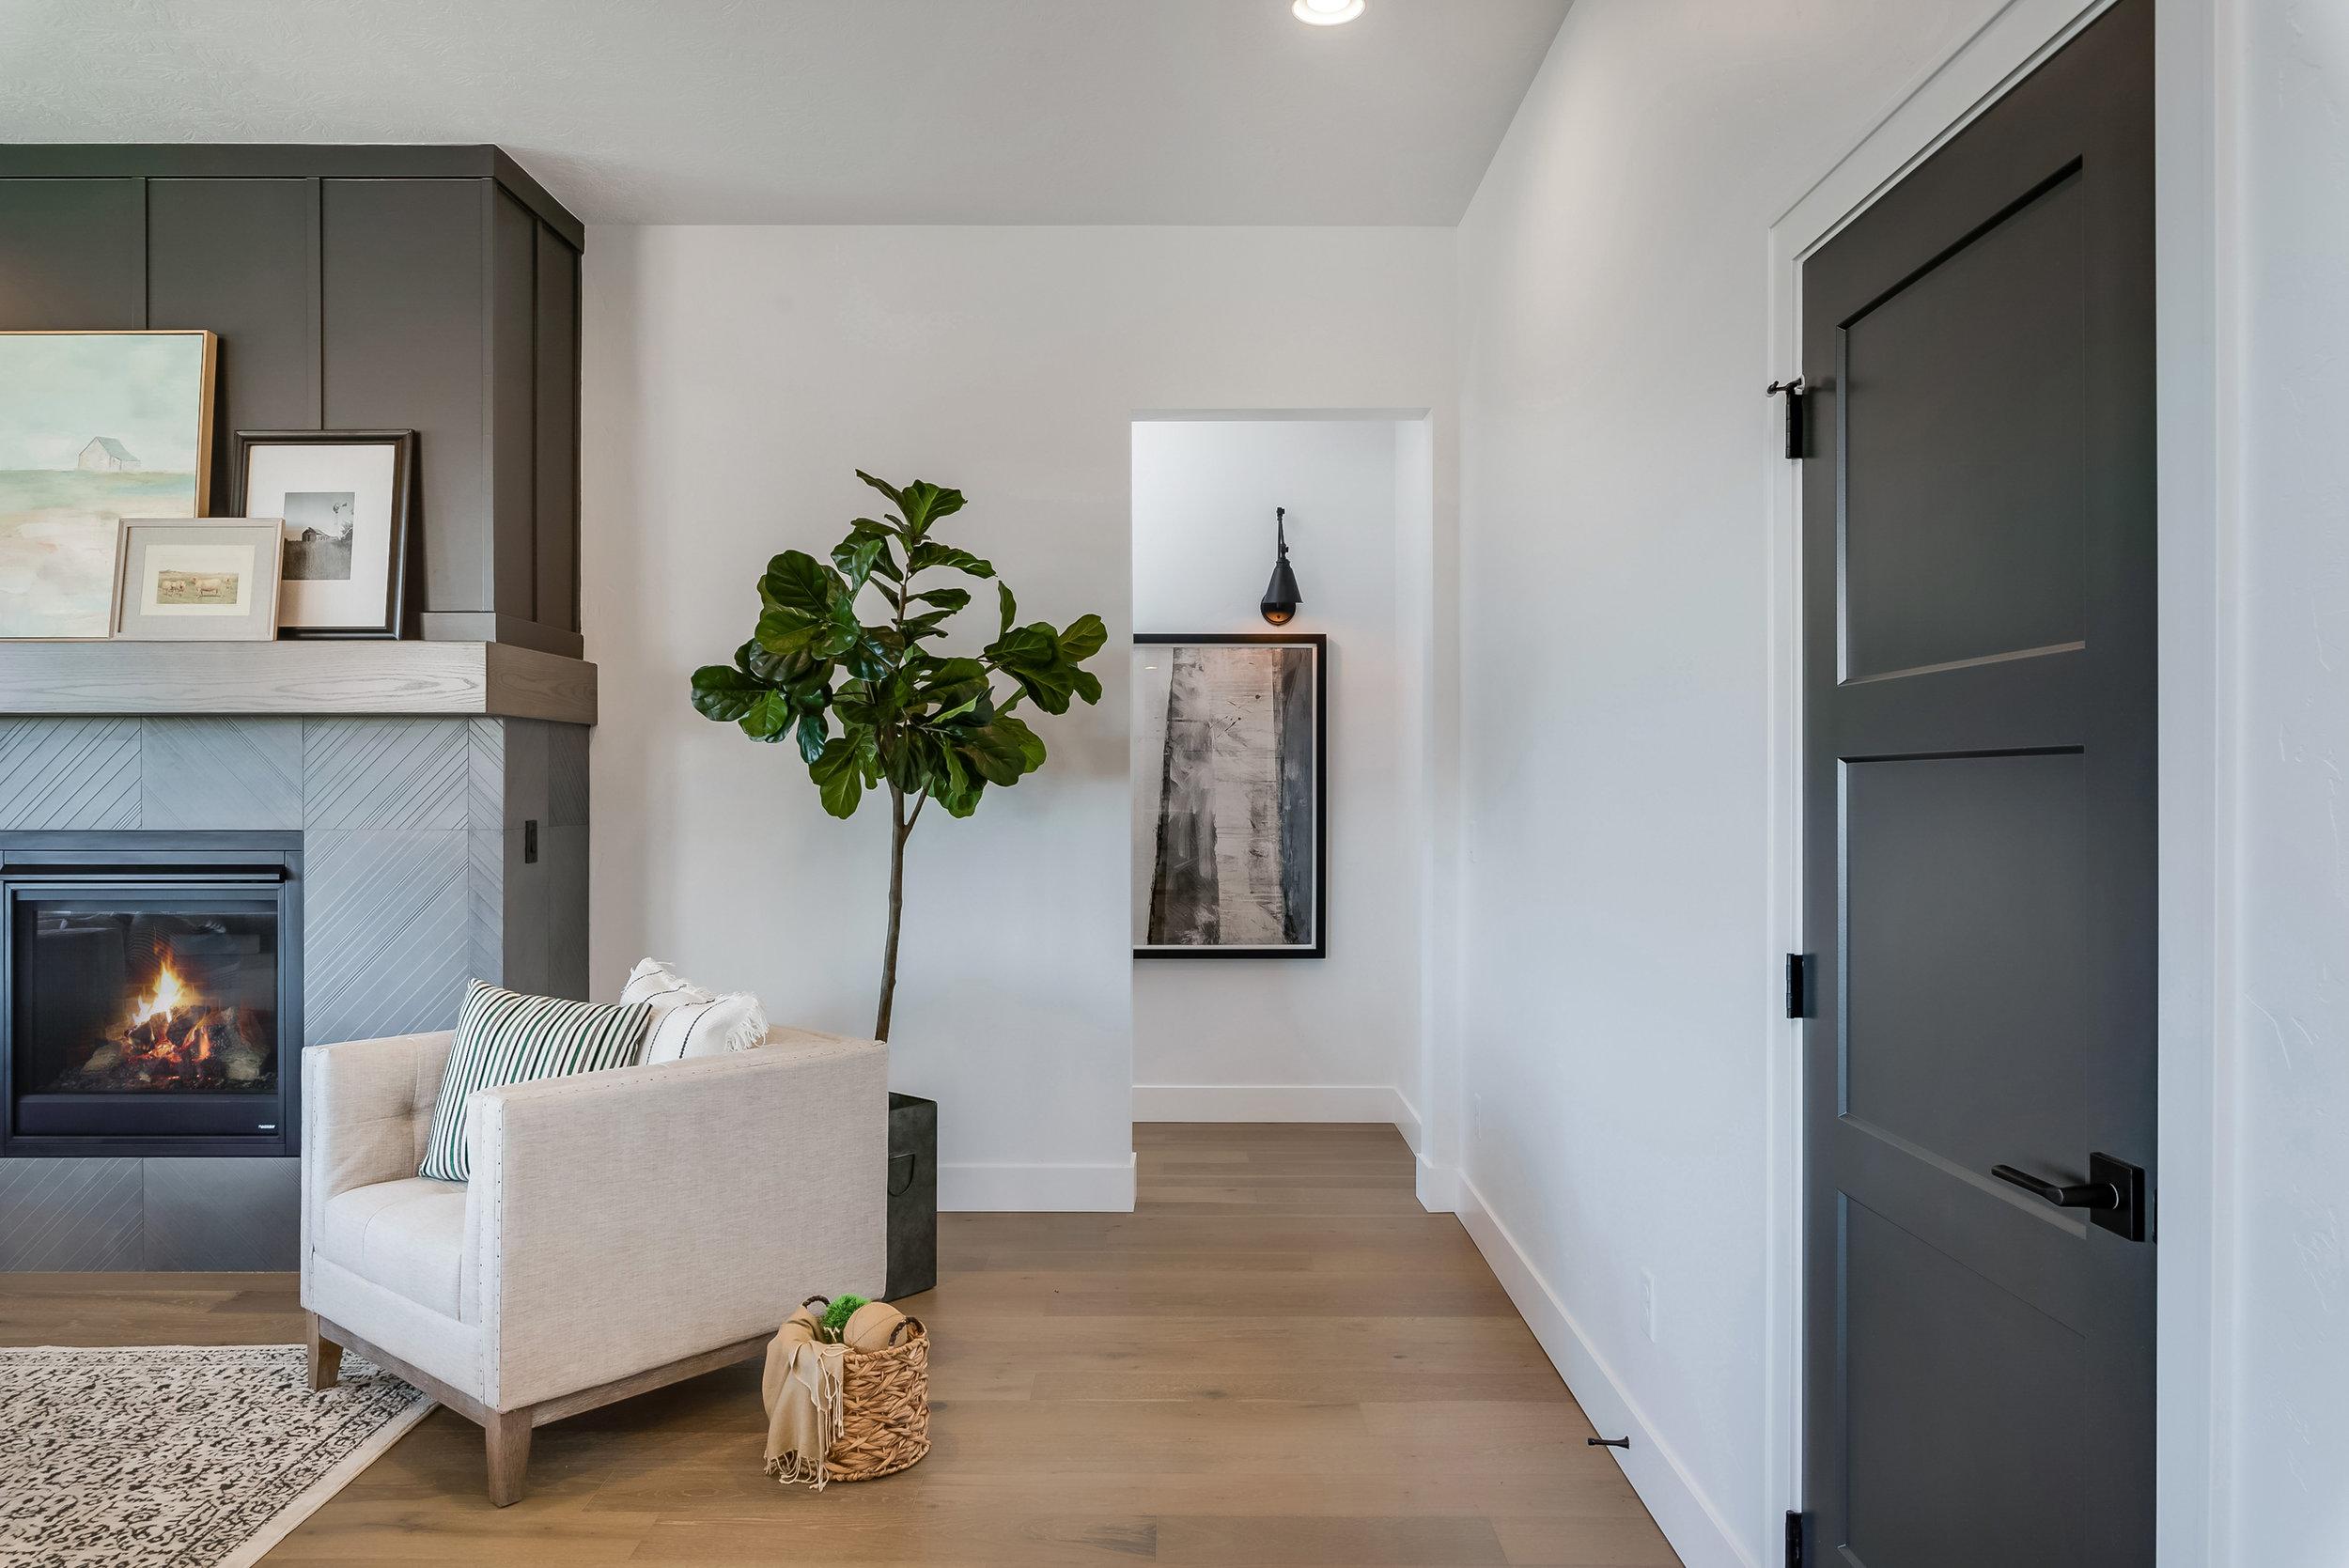 19-Living Area.jpg